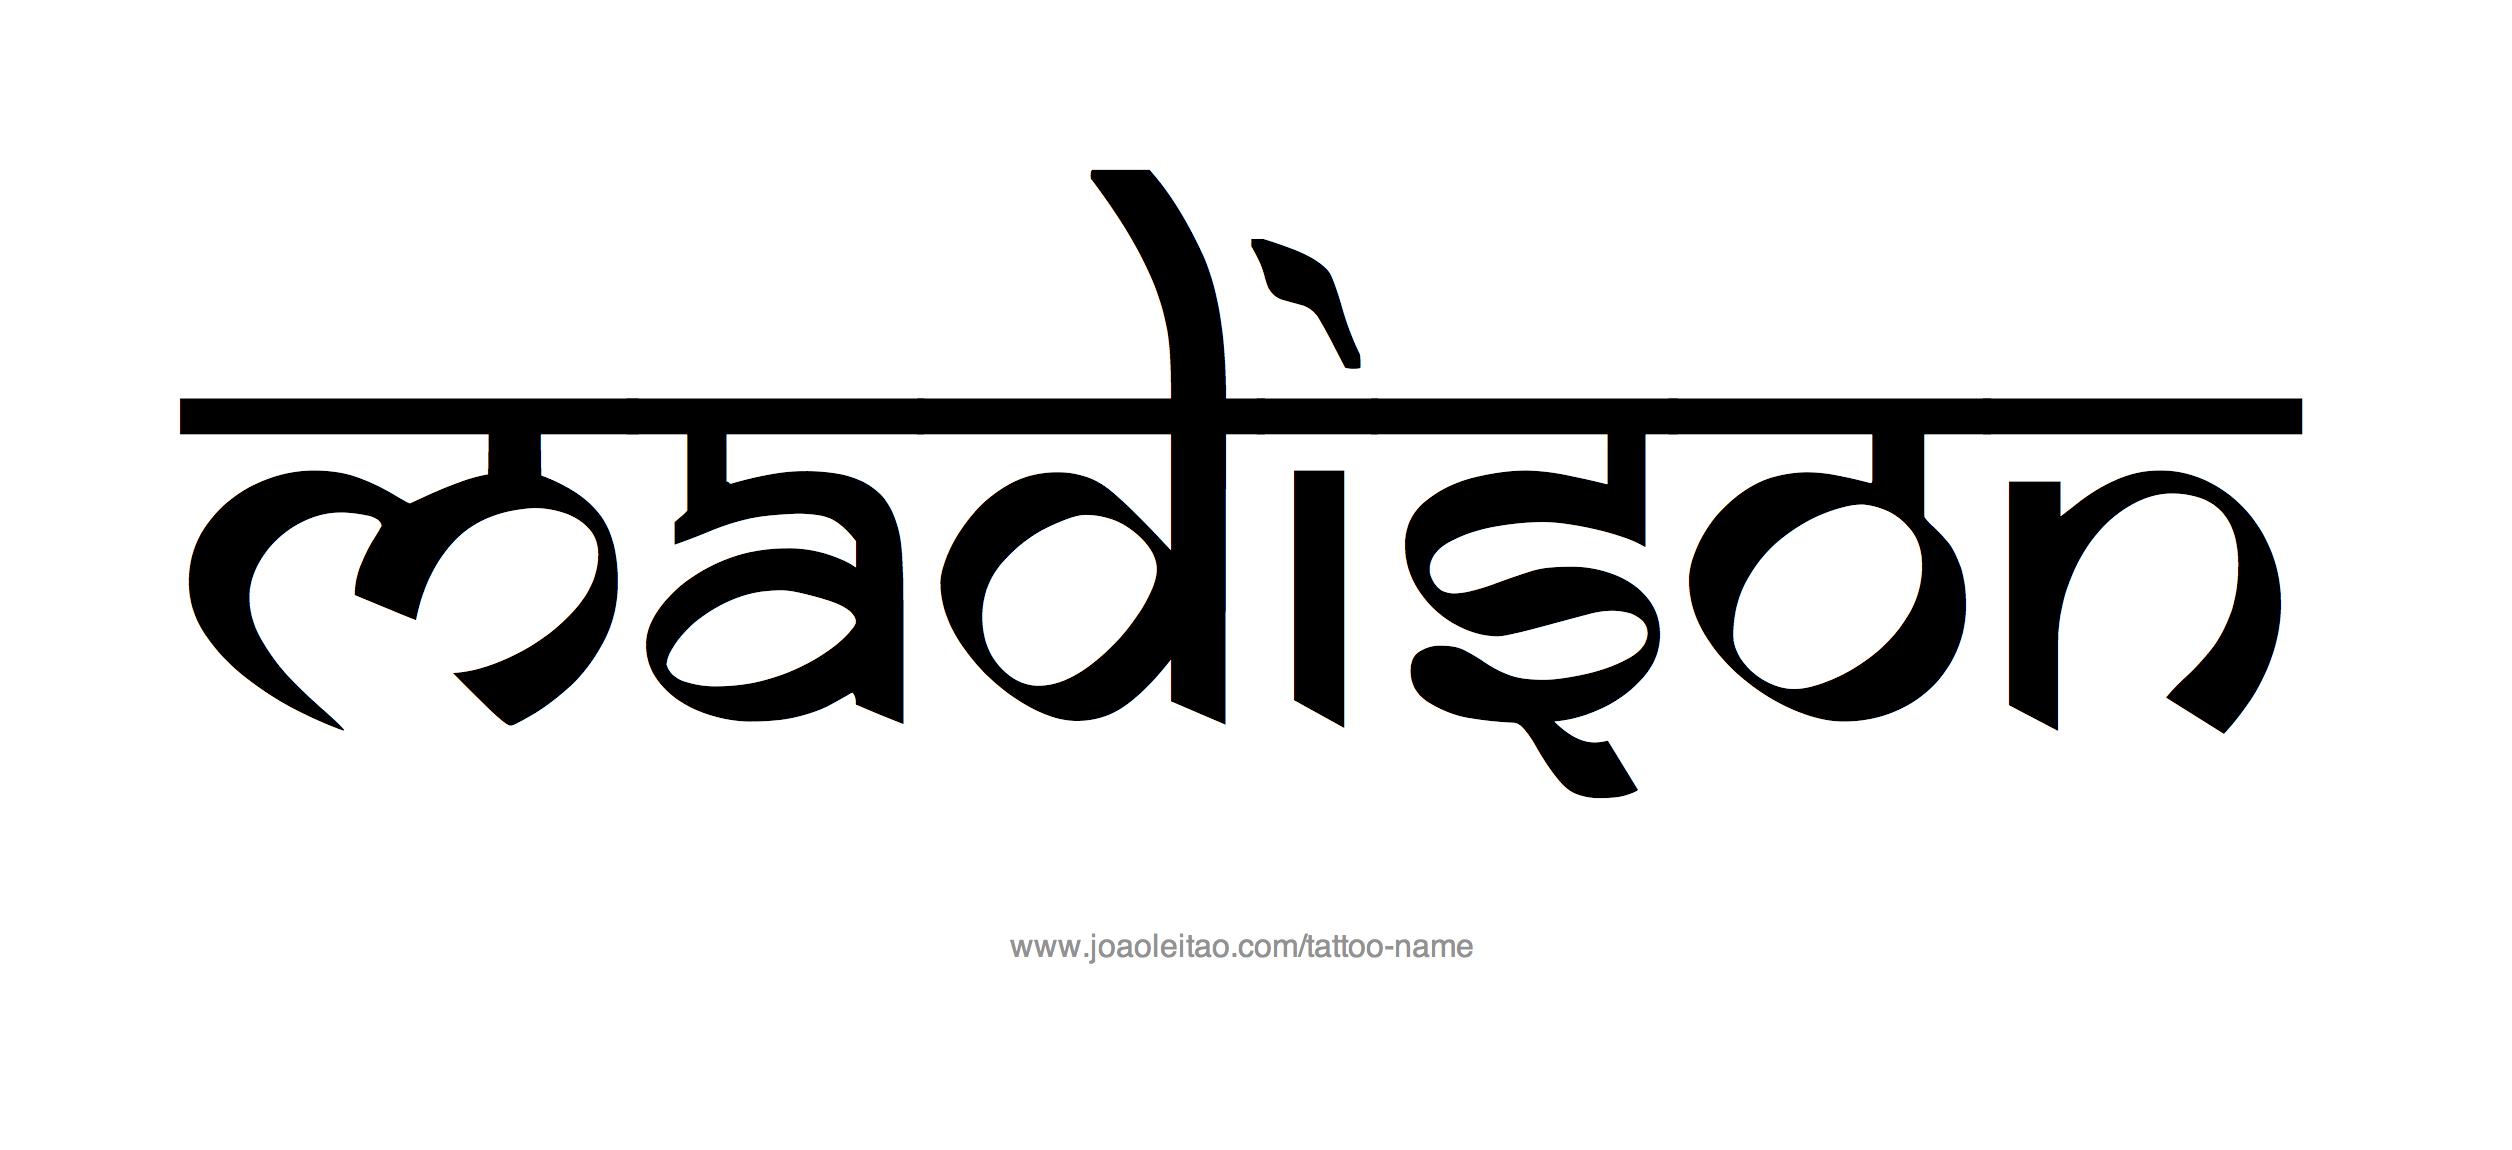 Name: Madison Name Tattoo Designs